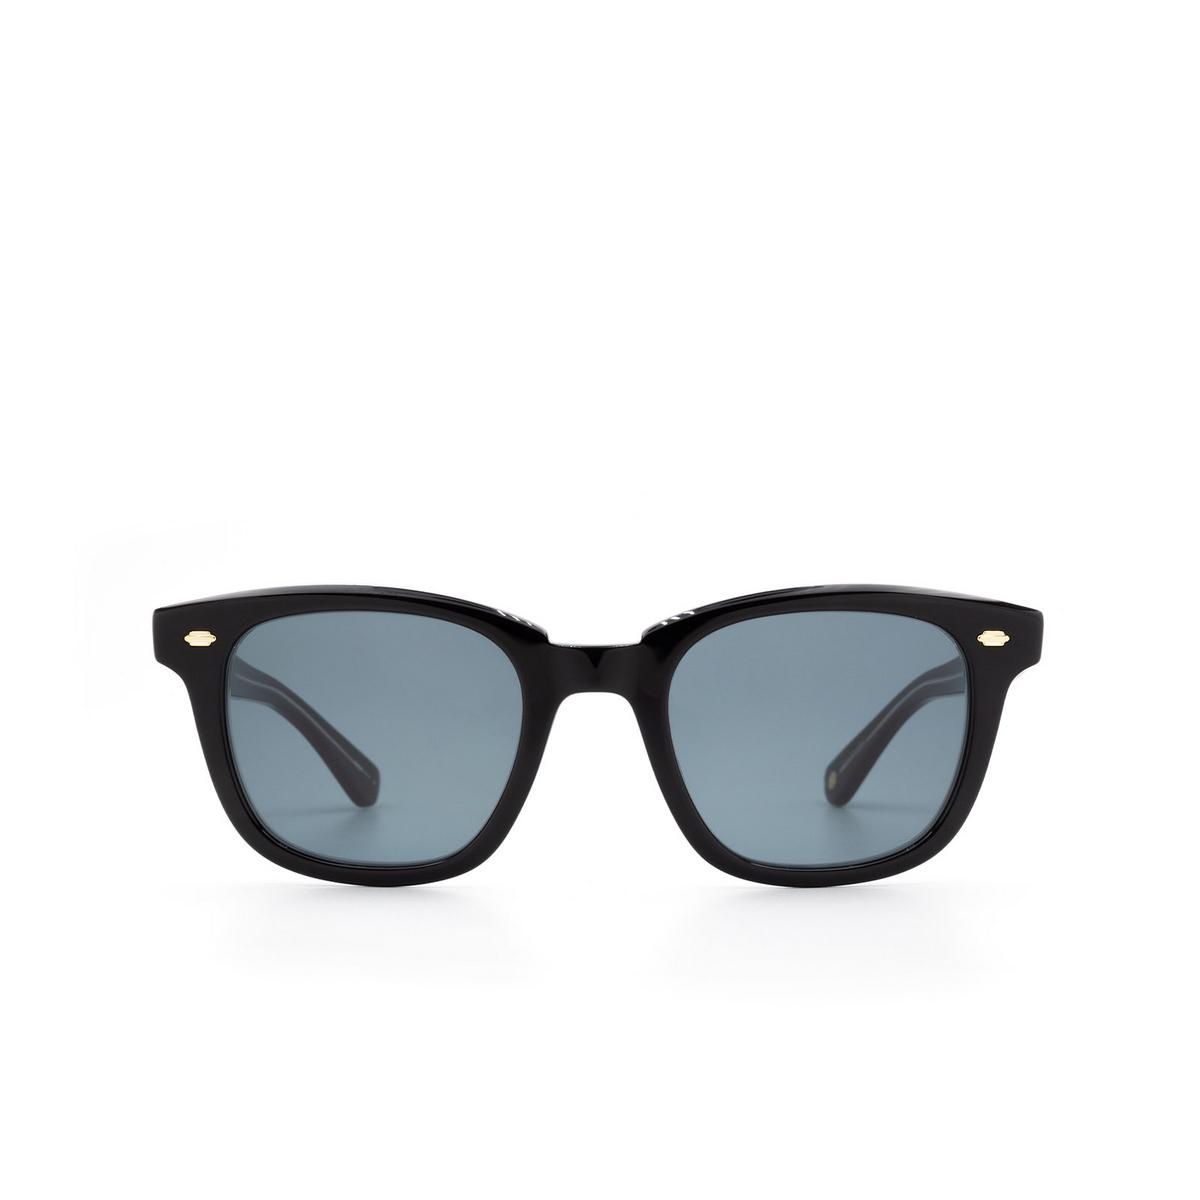 Garrett Leight® Sunglasses: Calabar color Black Laminate Bklcy-sfbs.